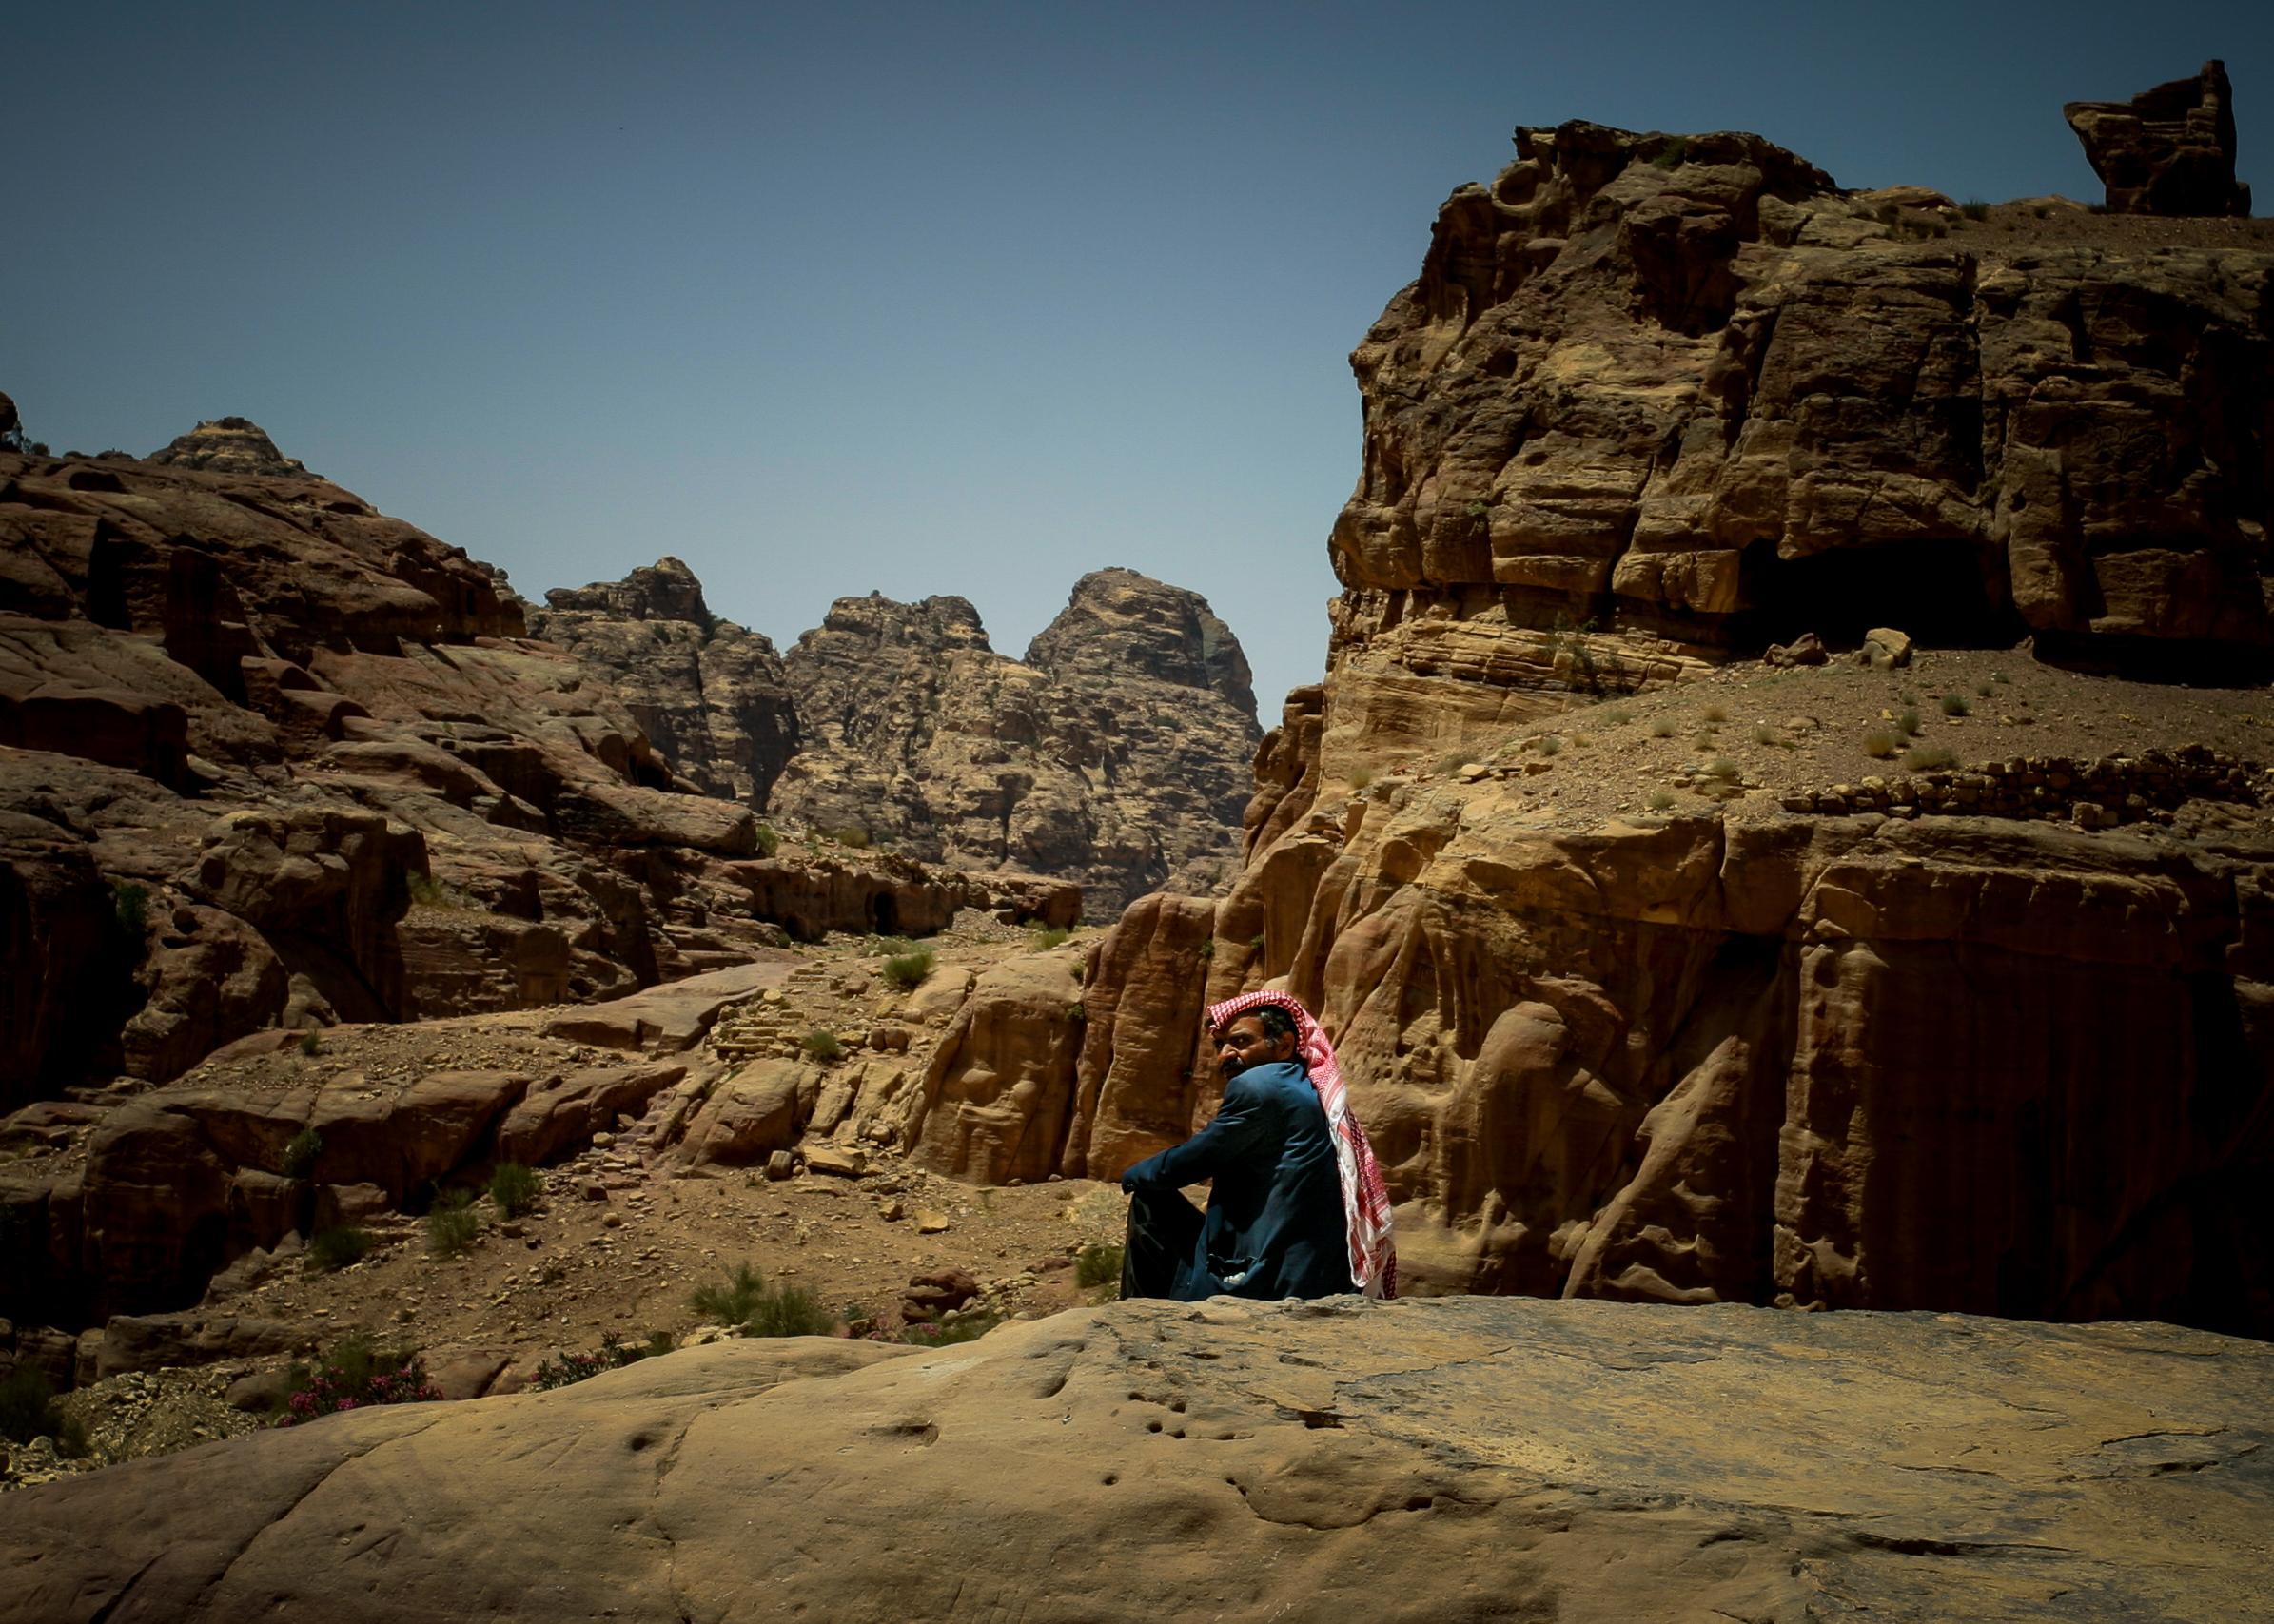 Filmmaker_Andrew_Hunt_in_Jordan-5.jpg